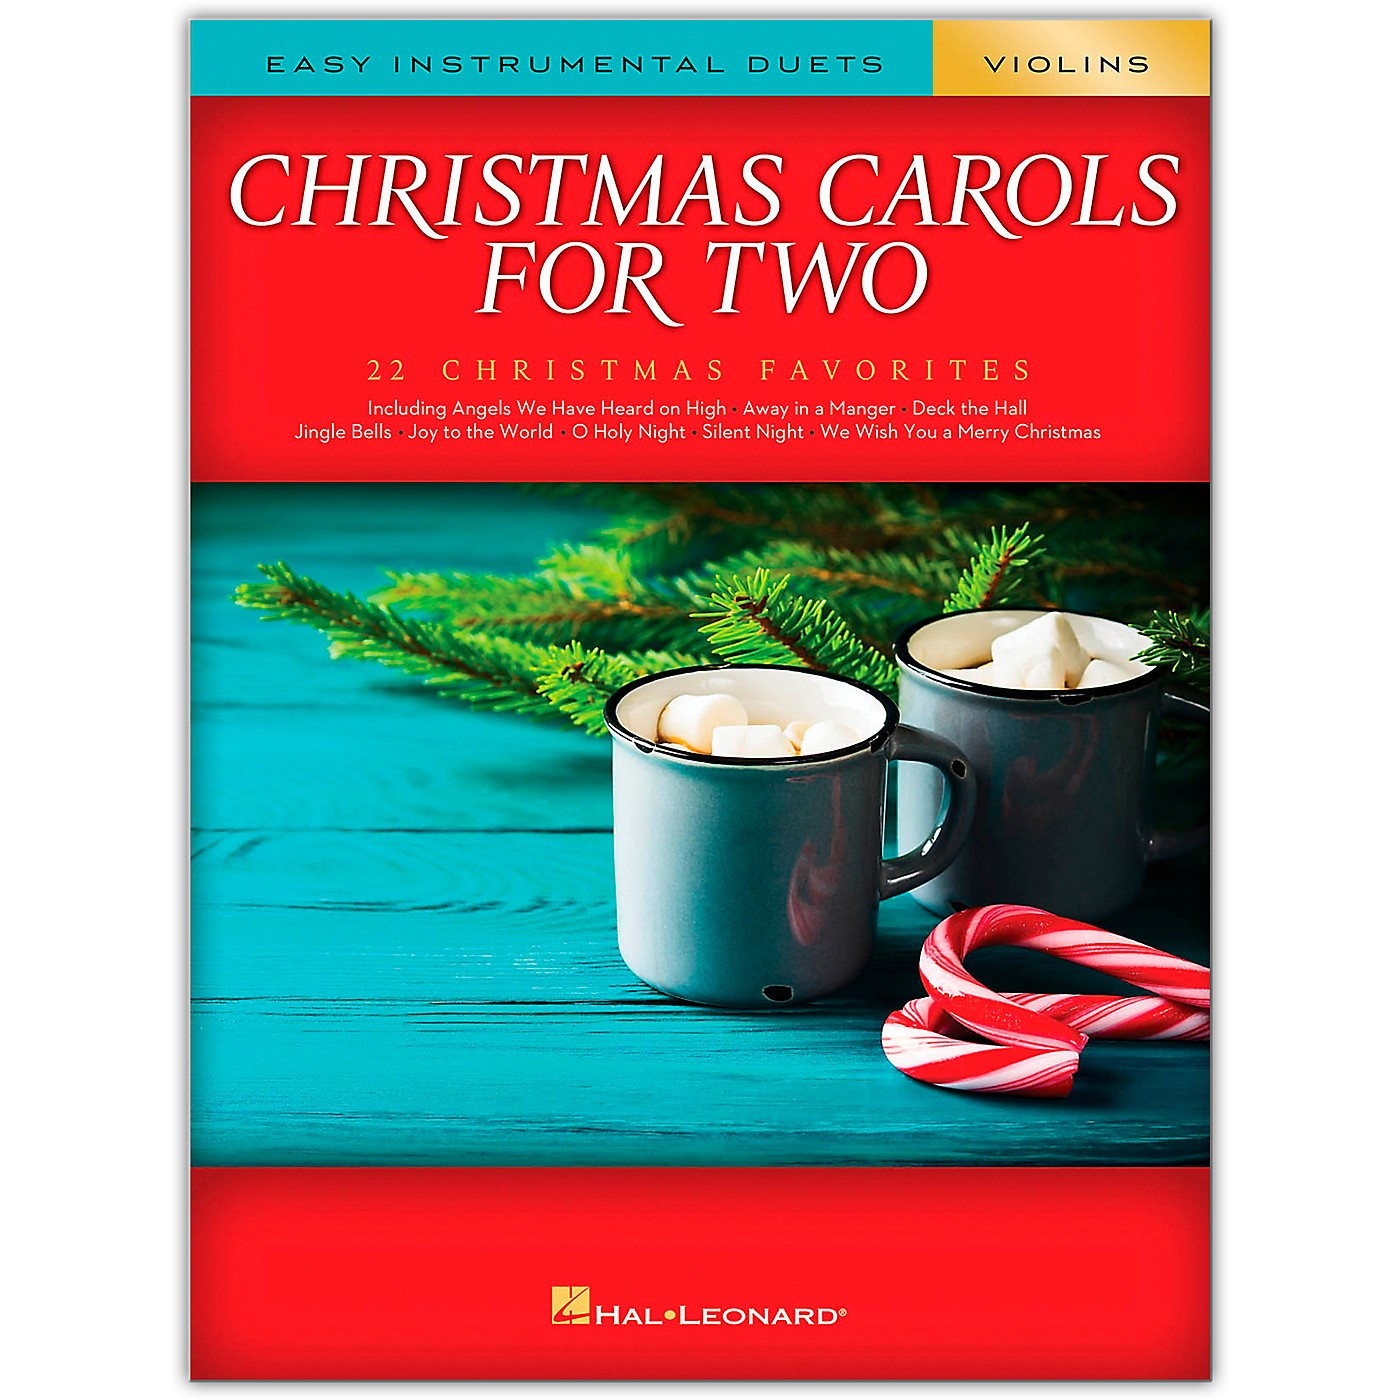 Hal Leonard Christmas Carols for Two Violins (Easy Instrumental Duets) Songbook thumbnail